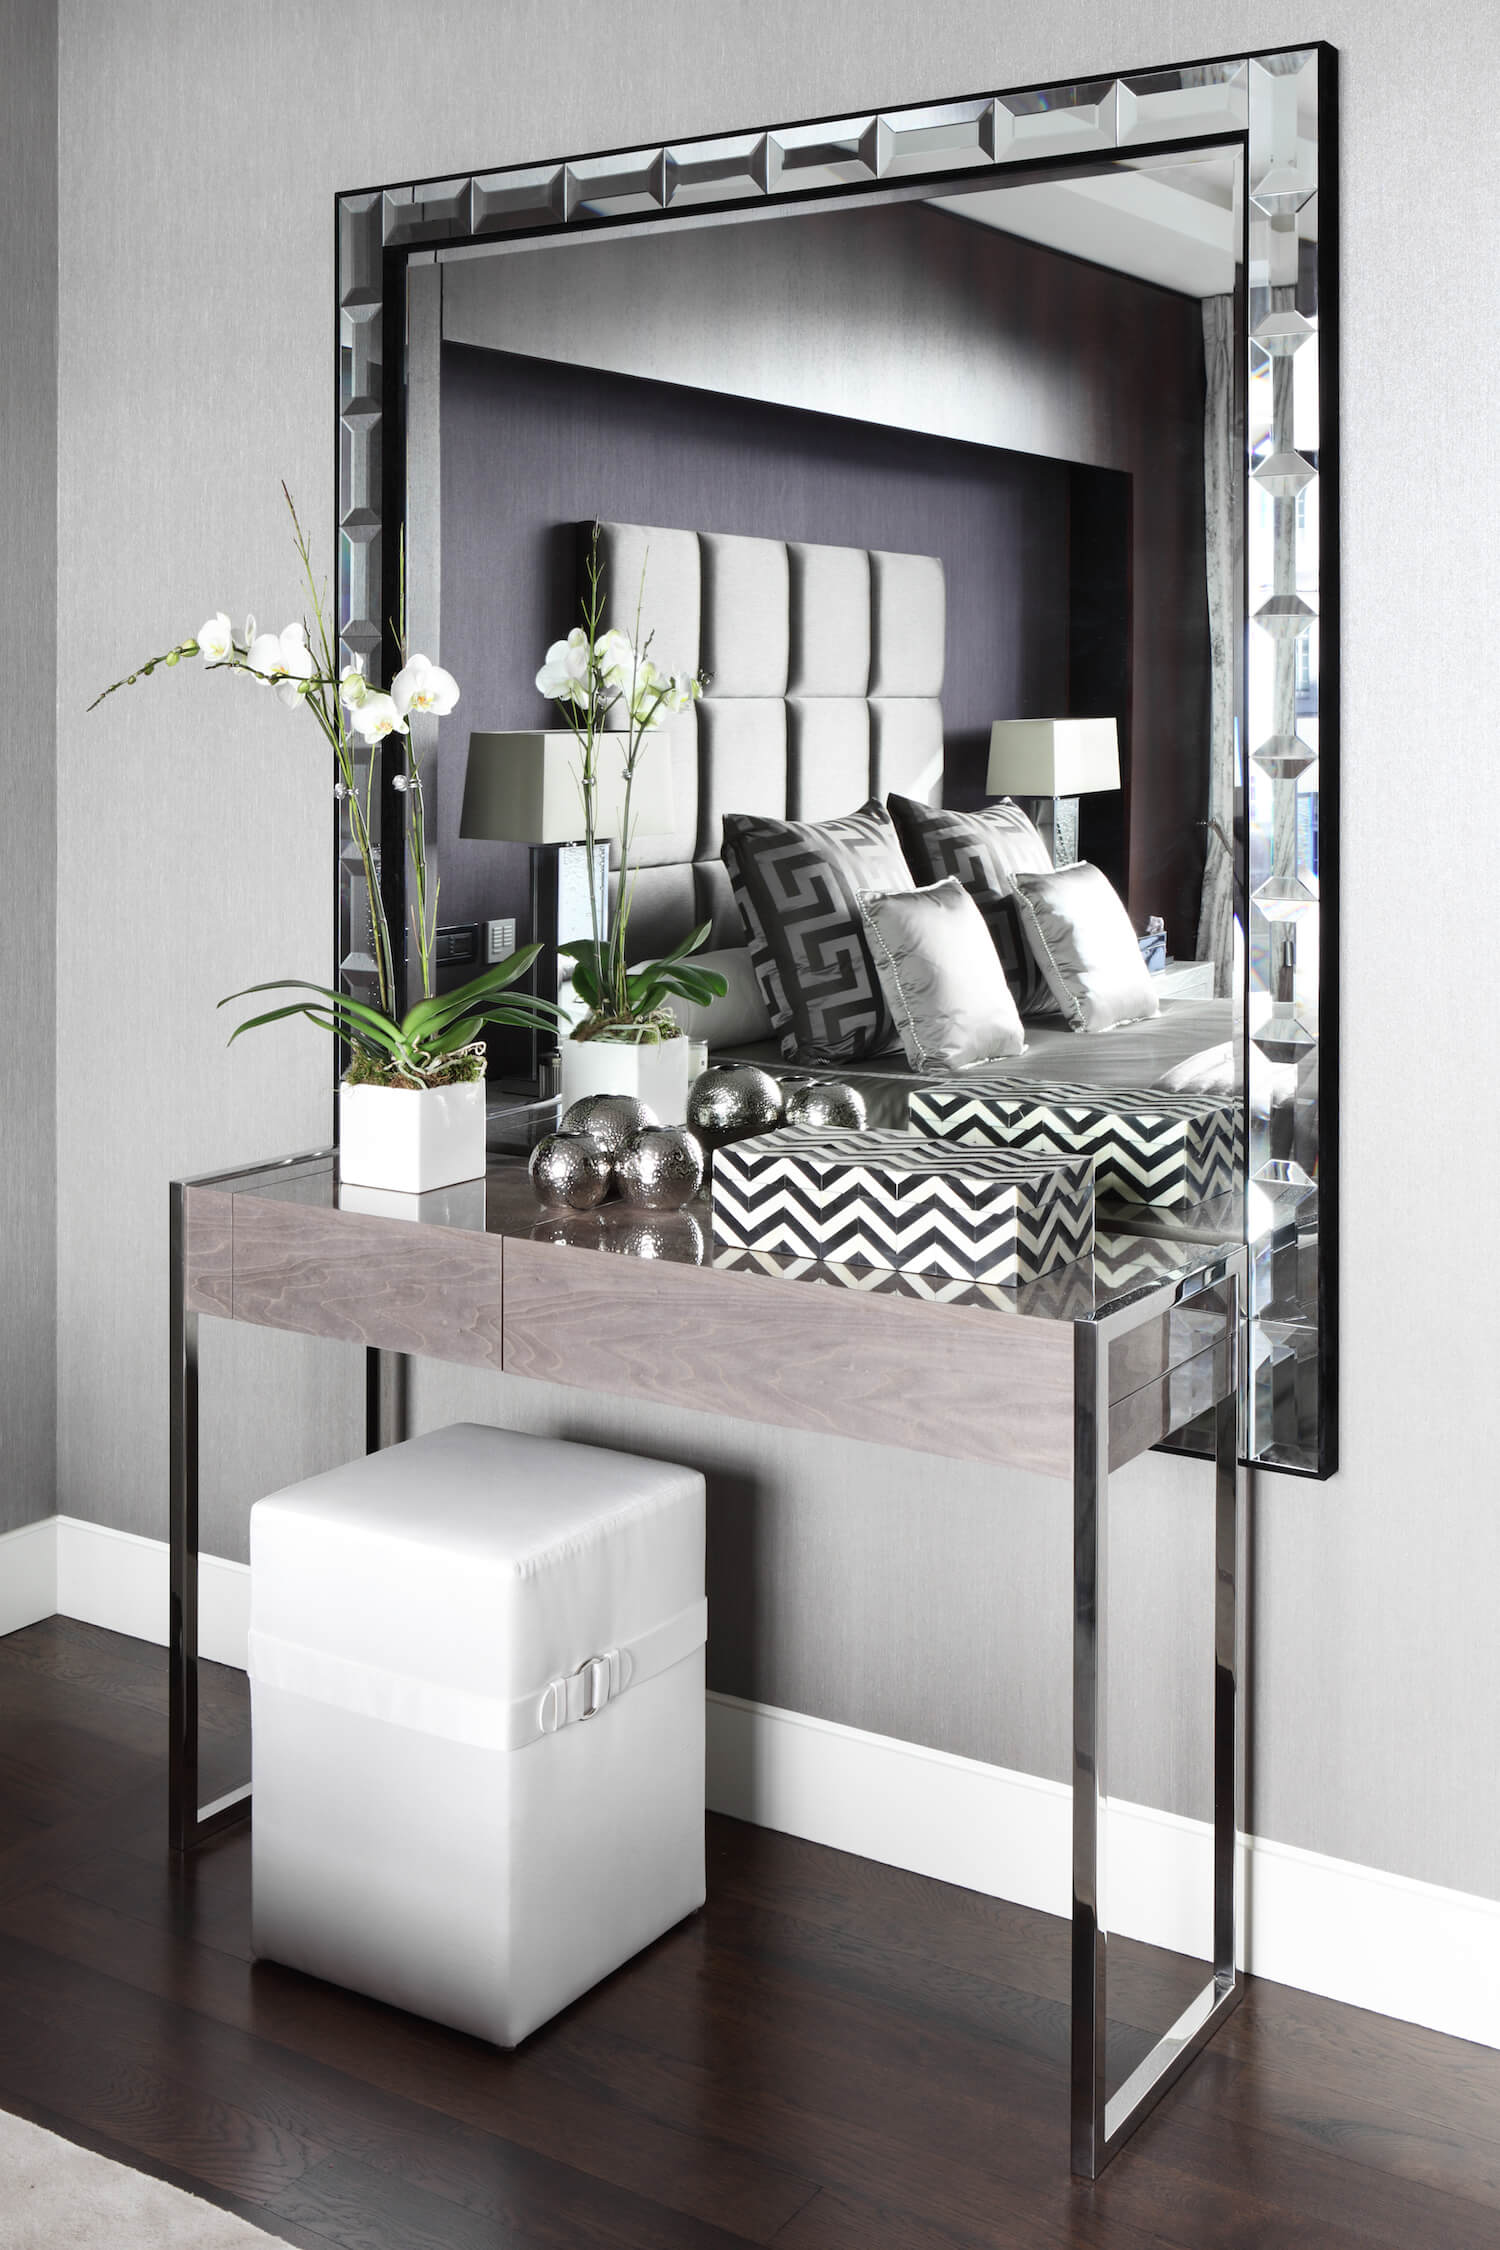 A bespoke dressing table in high gloss veneer with velvet lined storage is poised on delicate chrome legs, aiming for an air of feminine elegance.